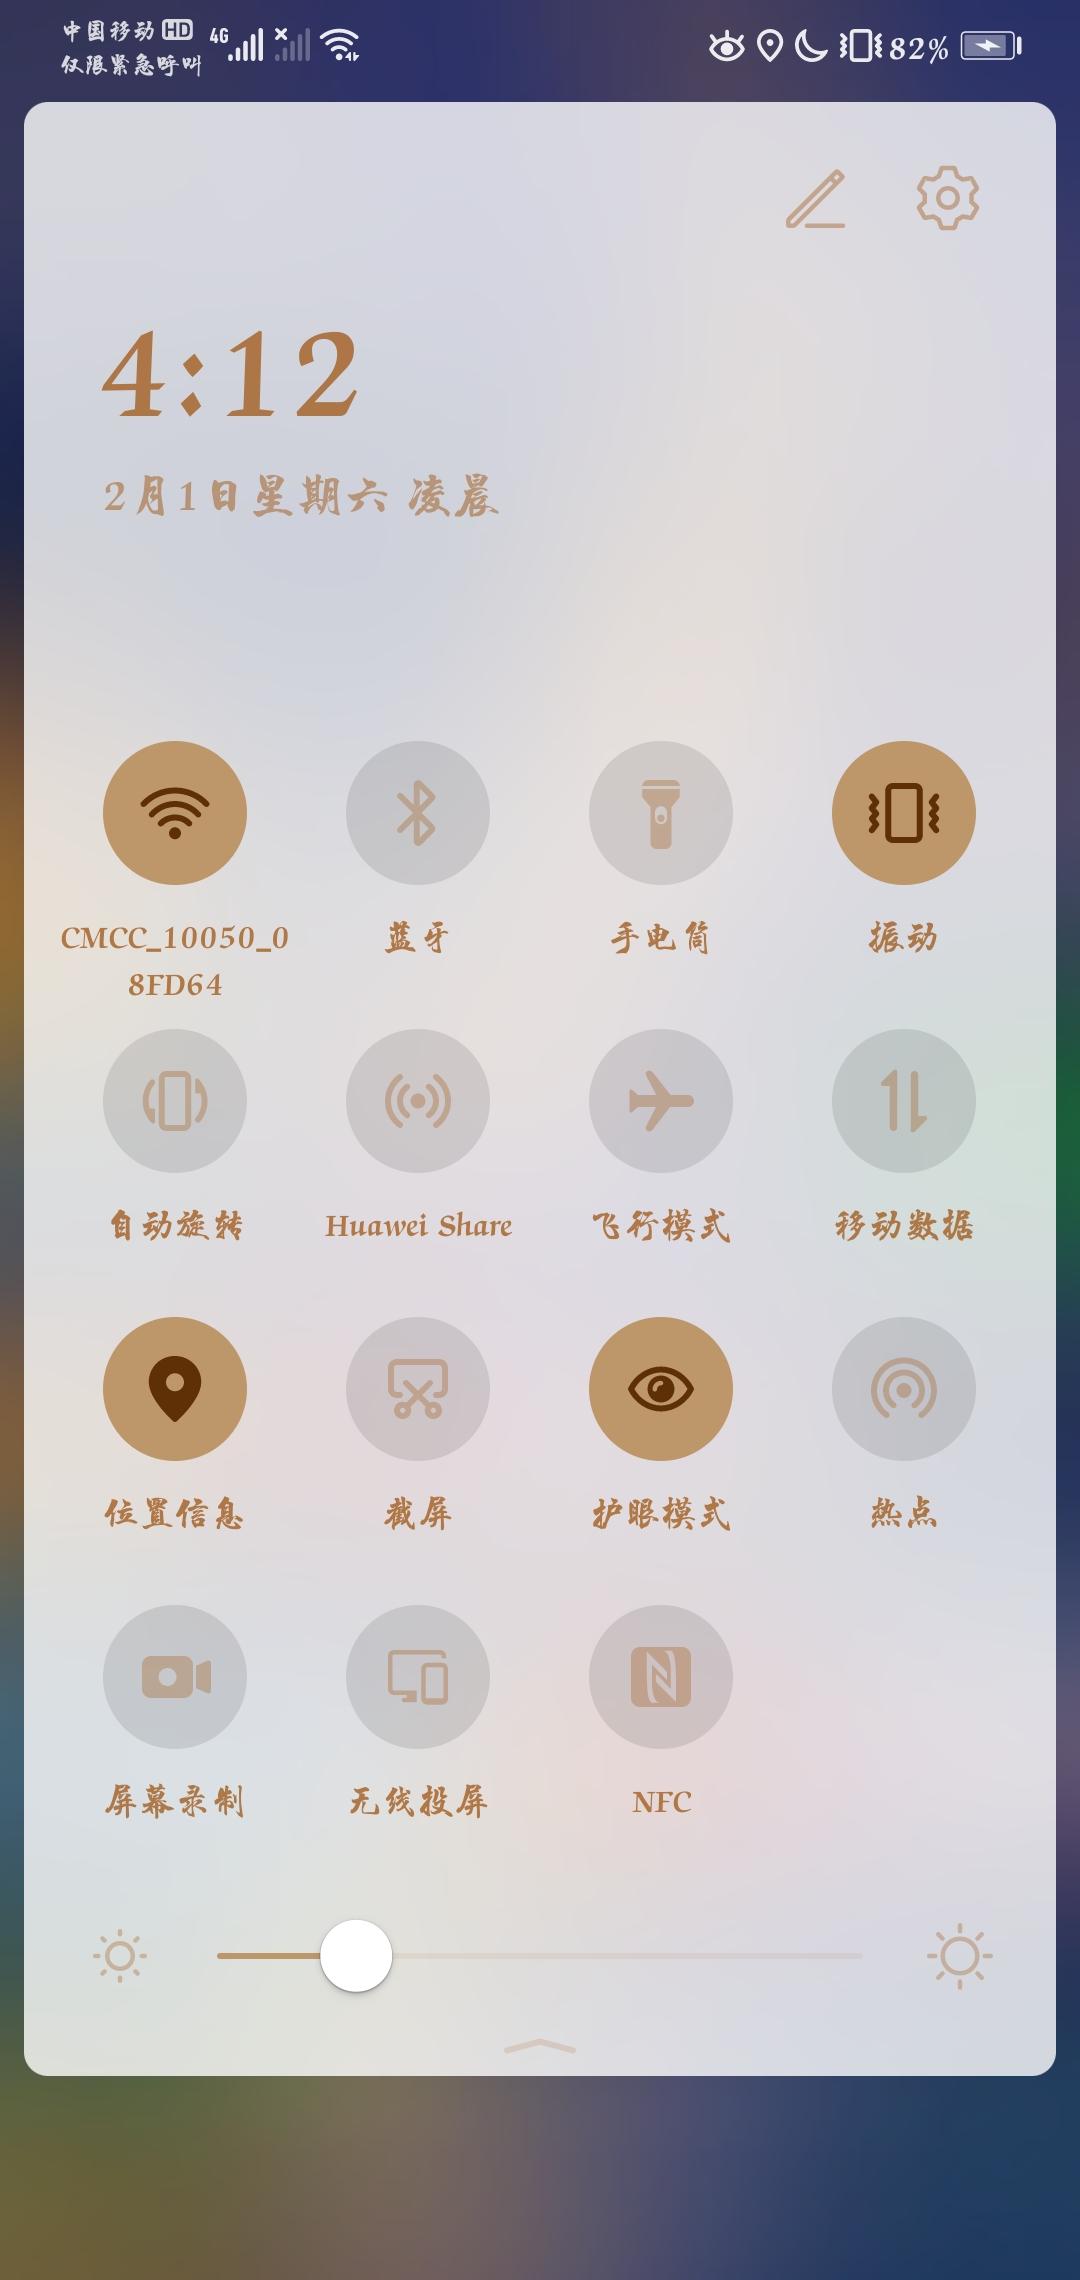 Screenshot_20200201_041218_com.huawei.android.lau.jpg